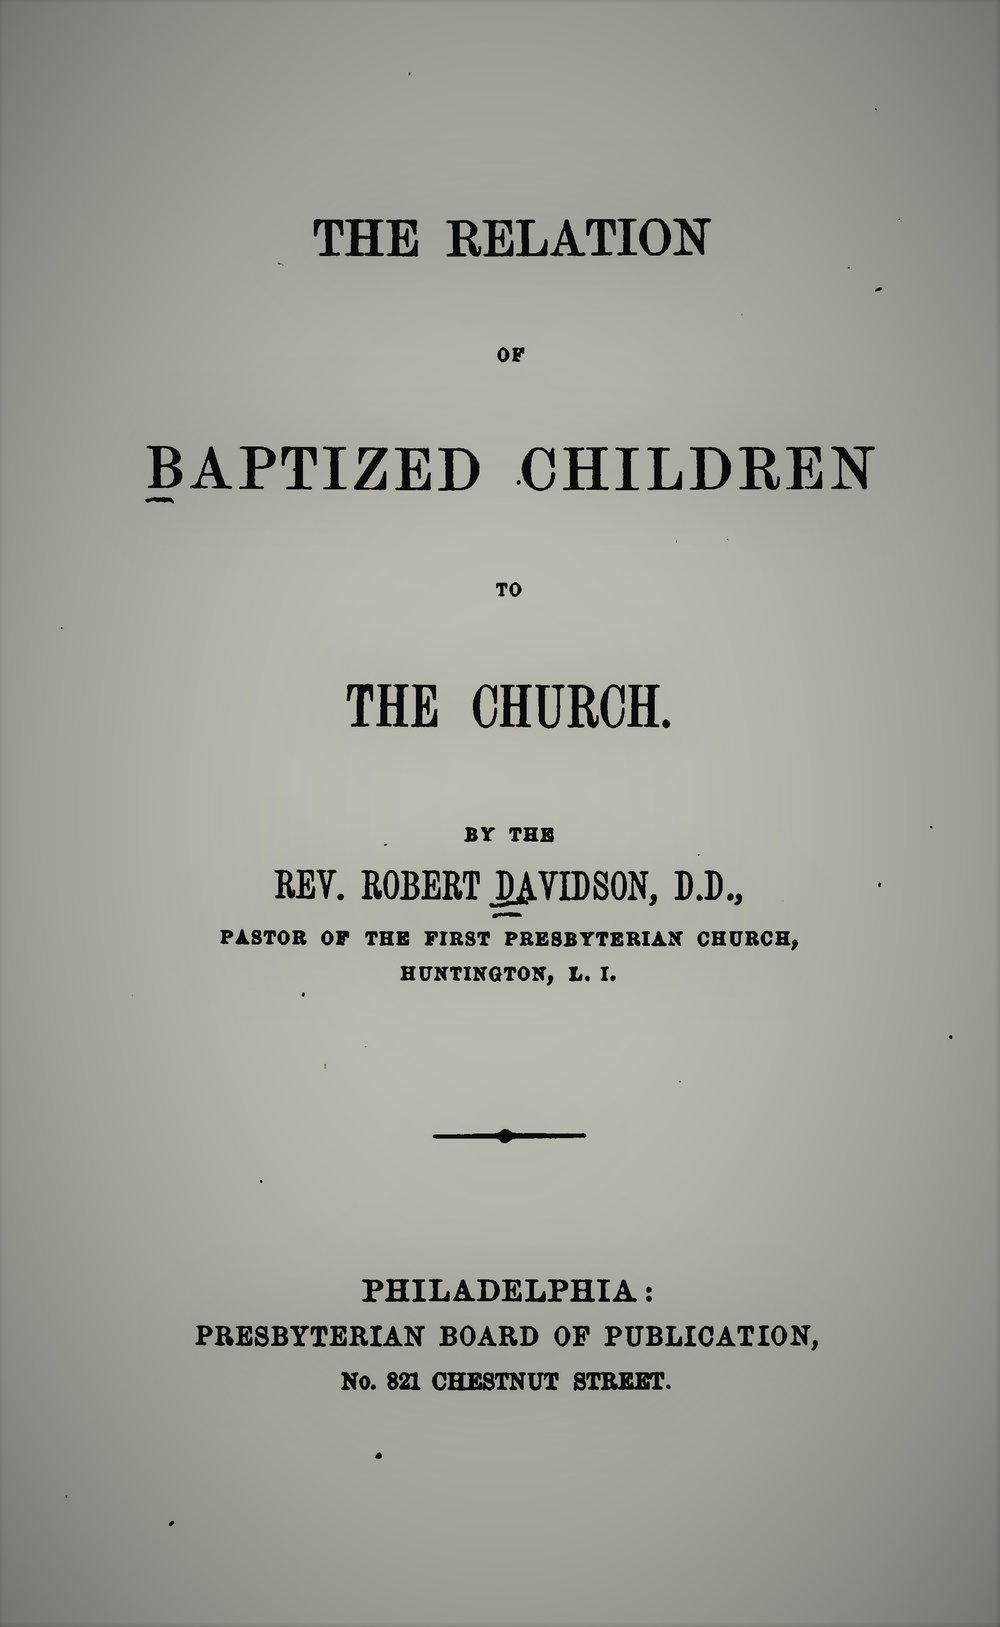 Davidson, Robert - Relation of Baptized Children to the Church.jpg